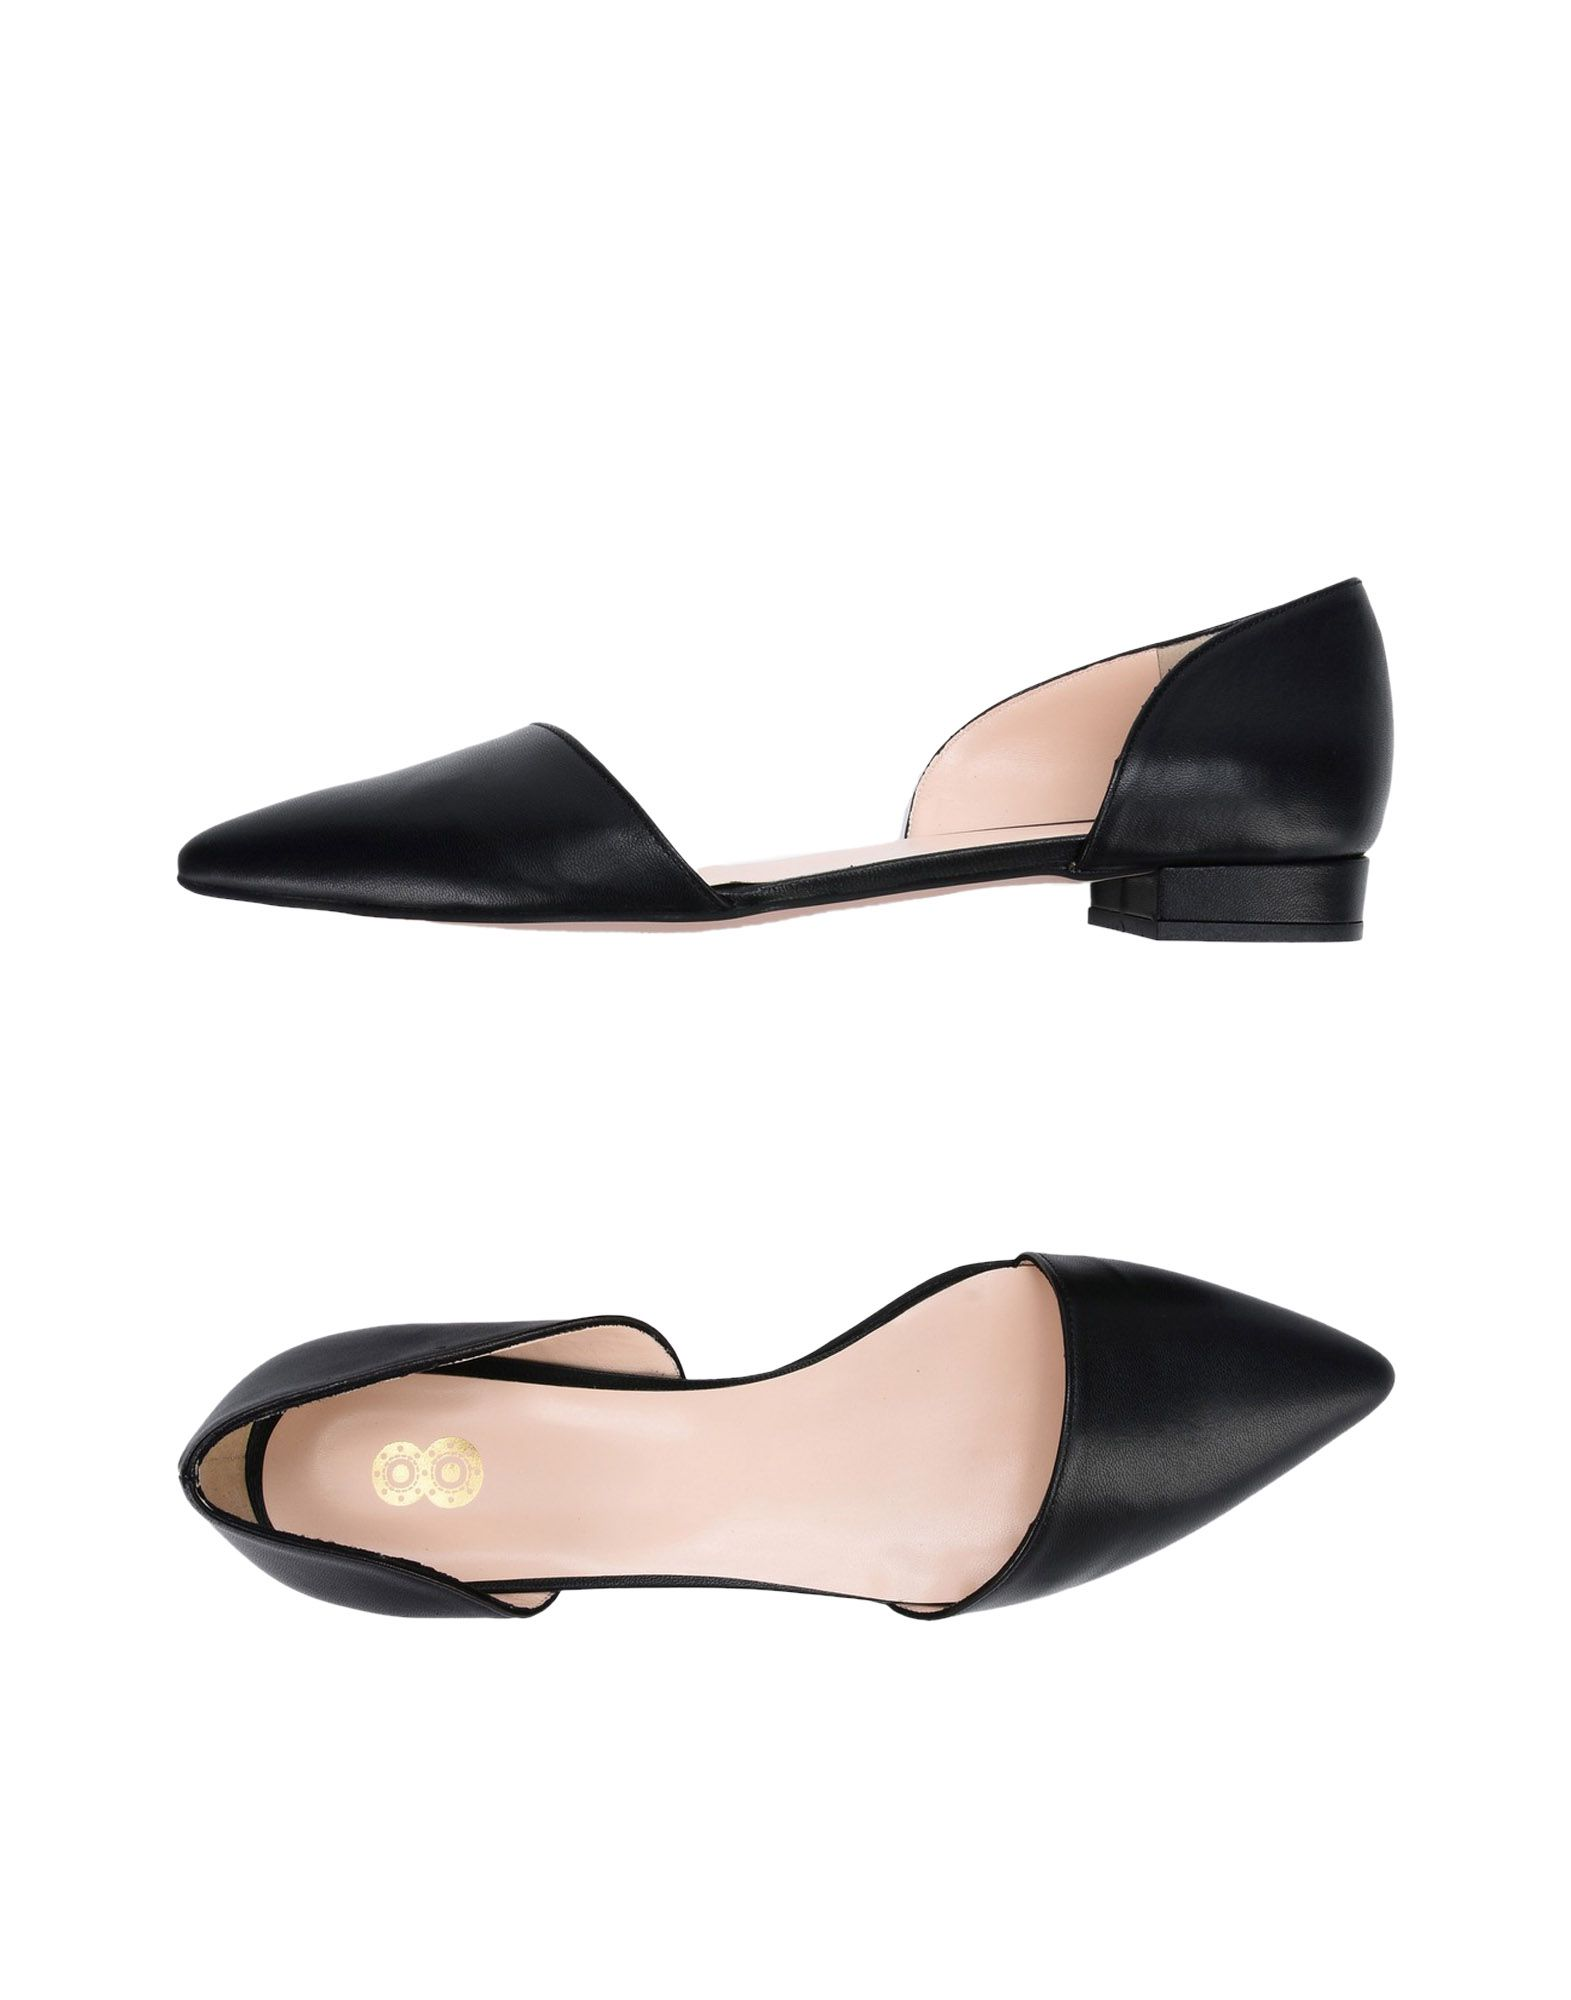 8 Ballerinas Gute Damen  11405655MB Gute Ballerinas Qualität beliebte Schuhe 238807